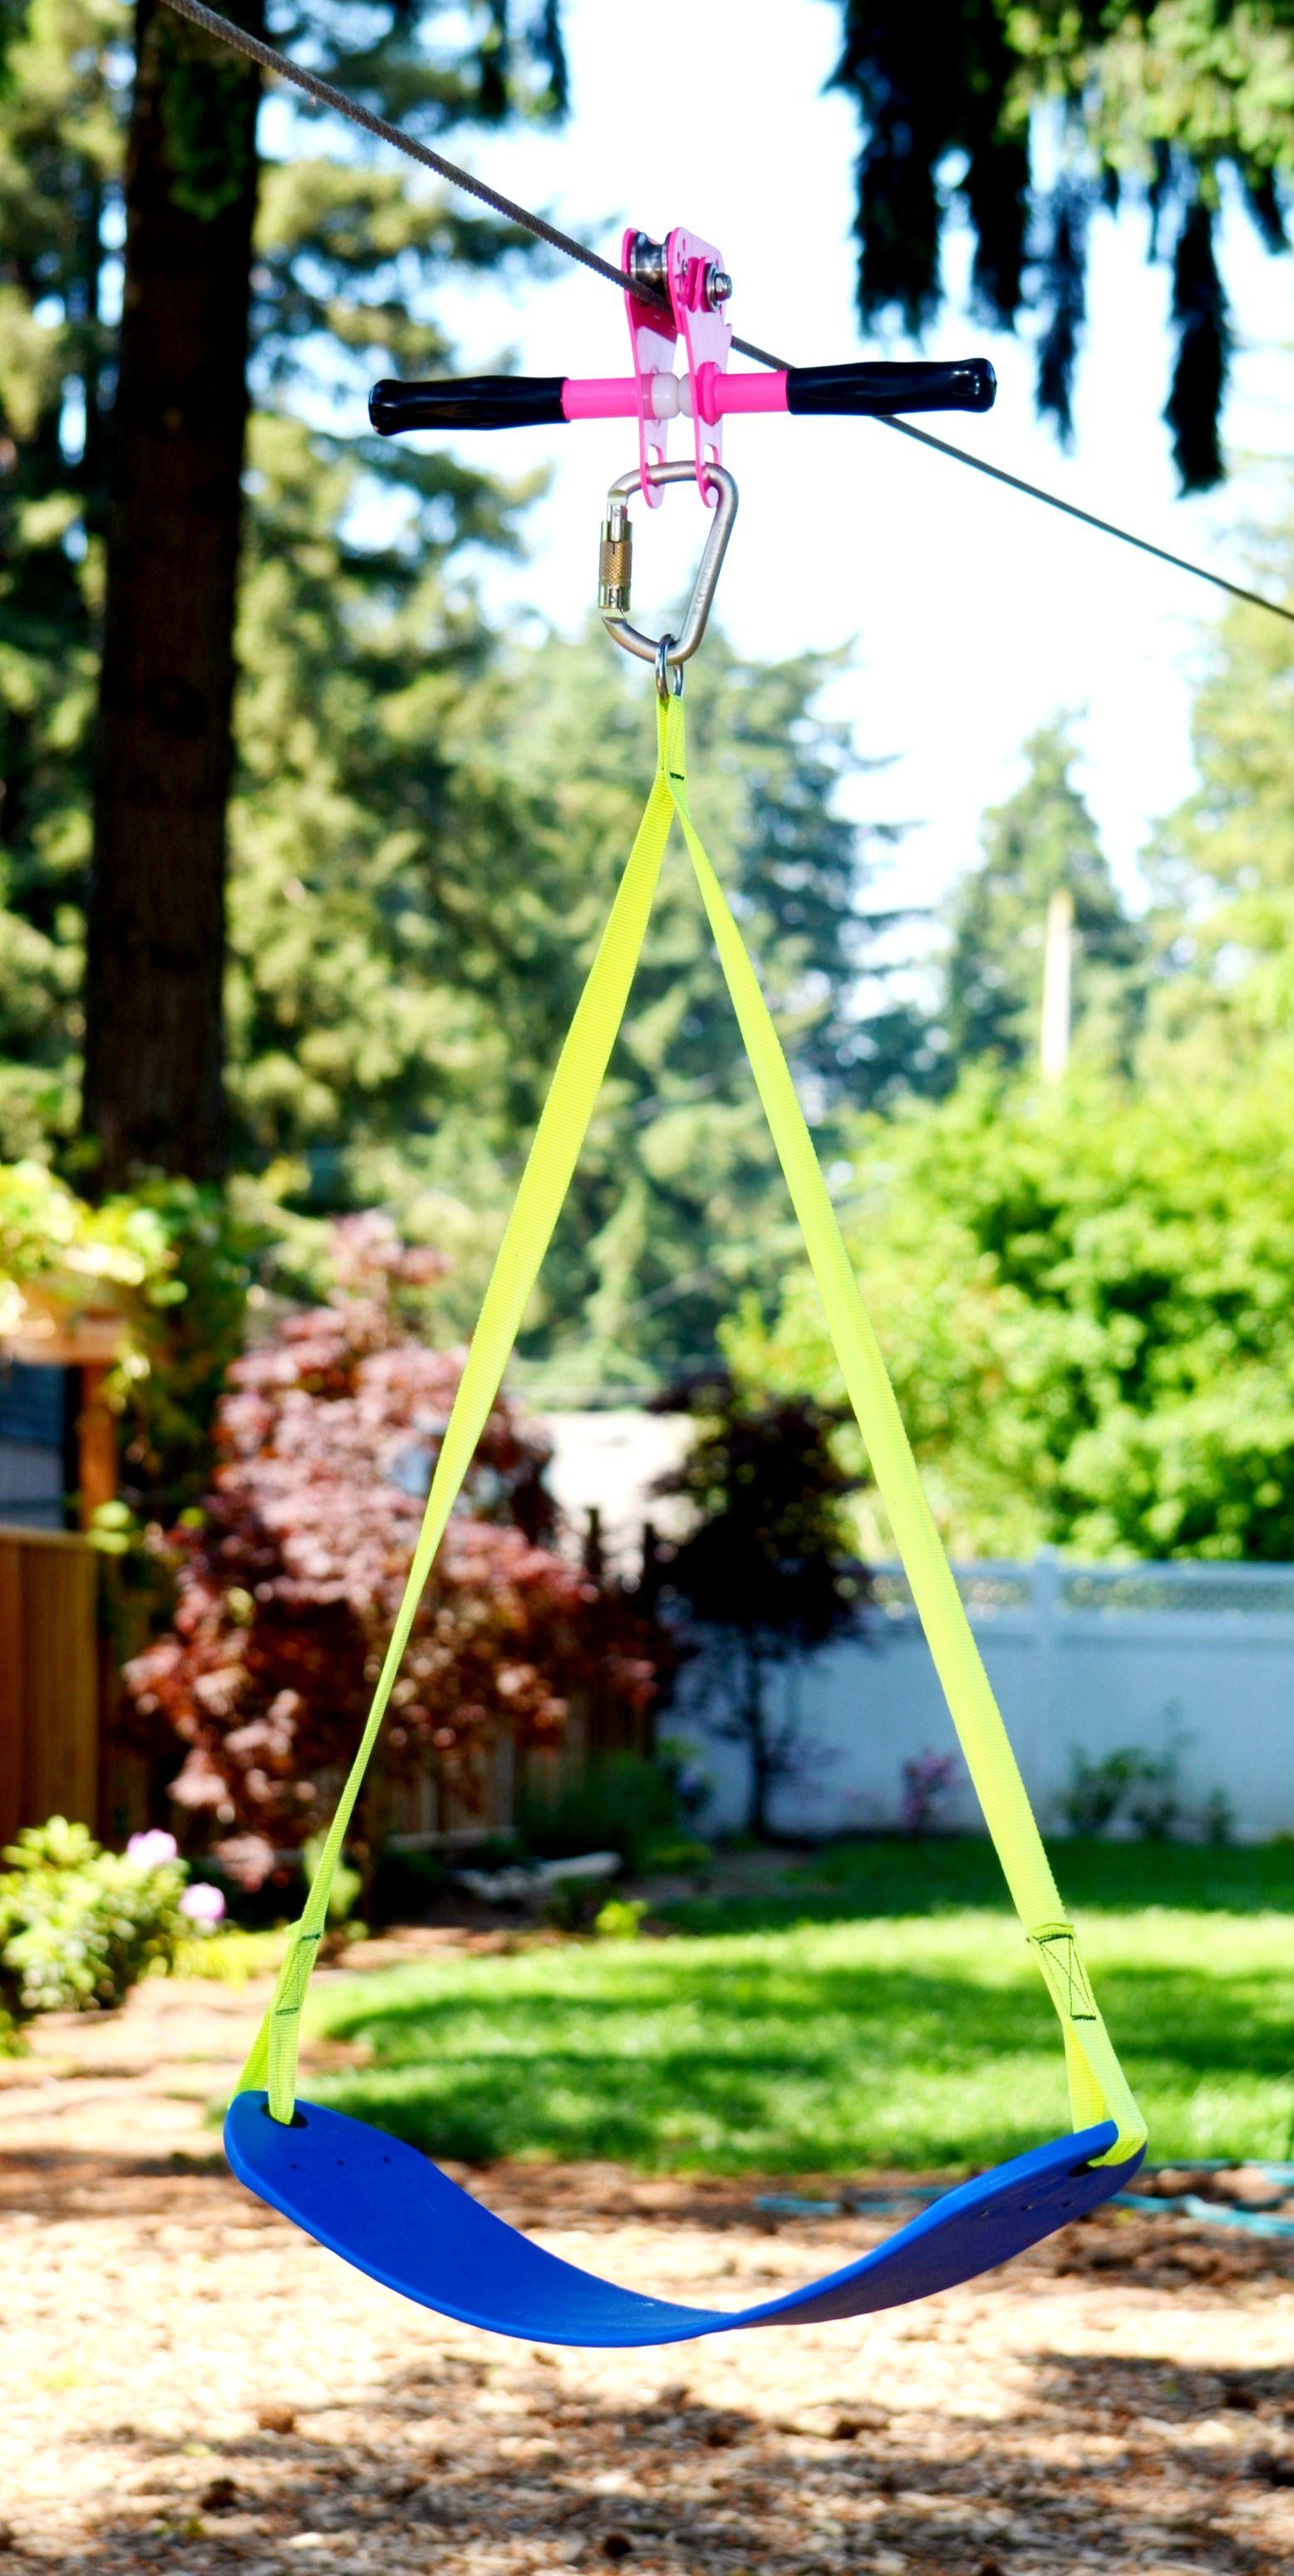 Brighten Up Your Zip Line This Summer Diy Playground Zip Line Backyard Tree House Kids Diy backyard roller coaster kit